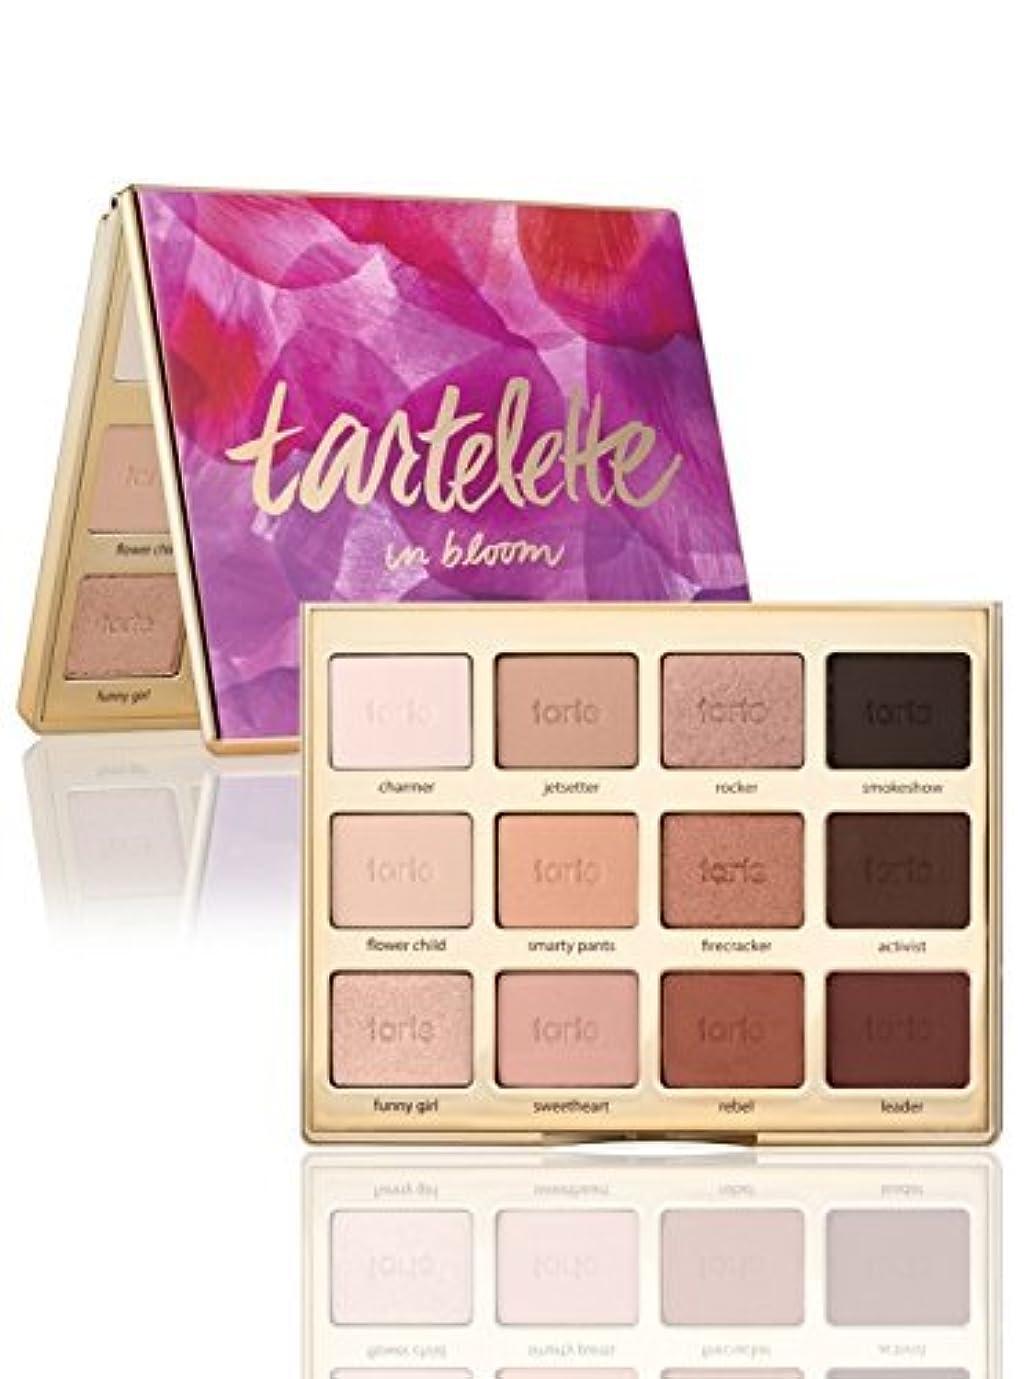 櫛入射空港TARTE Tartelette 2 In Bloom Palette